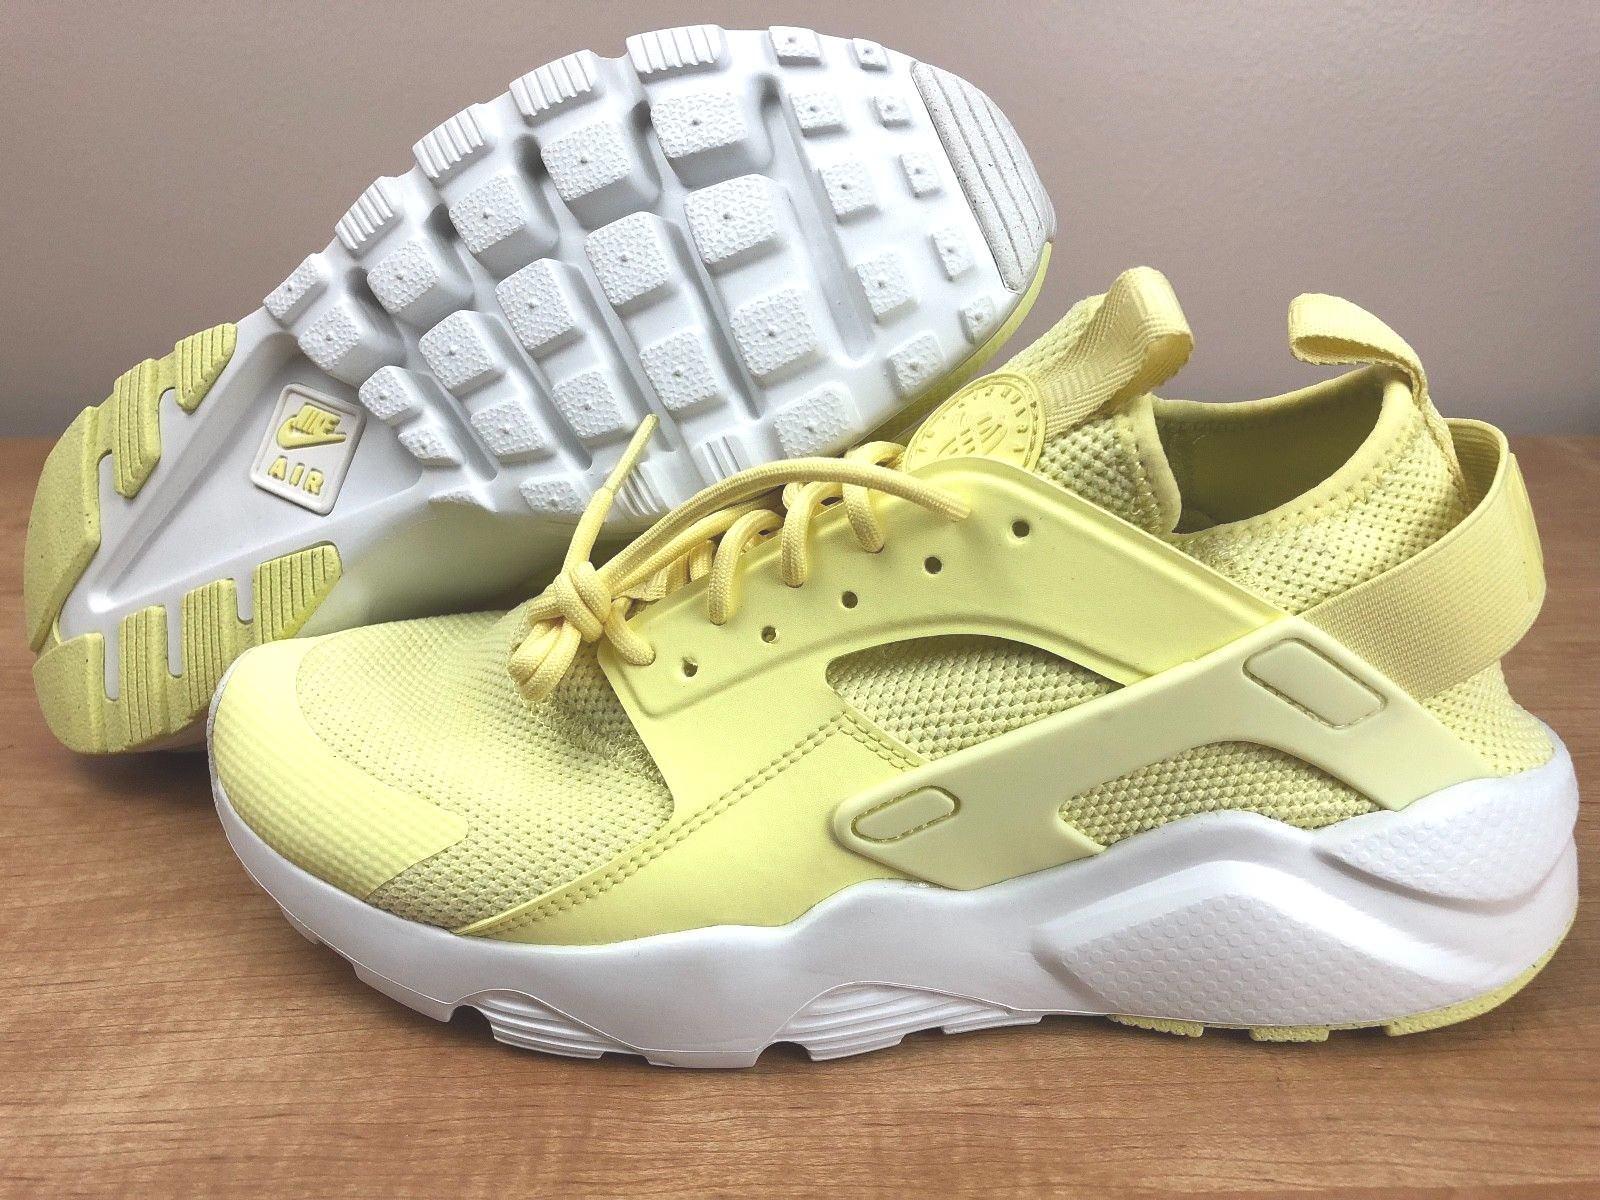 Nike air huarache lemon correre ultra - br lemon huarache chiffon 833147-701 dimensioni 10,5 7fcd91